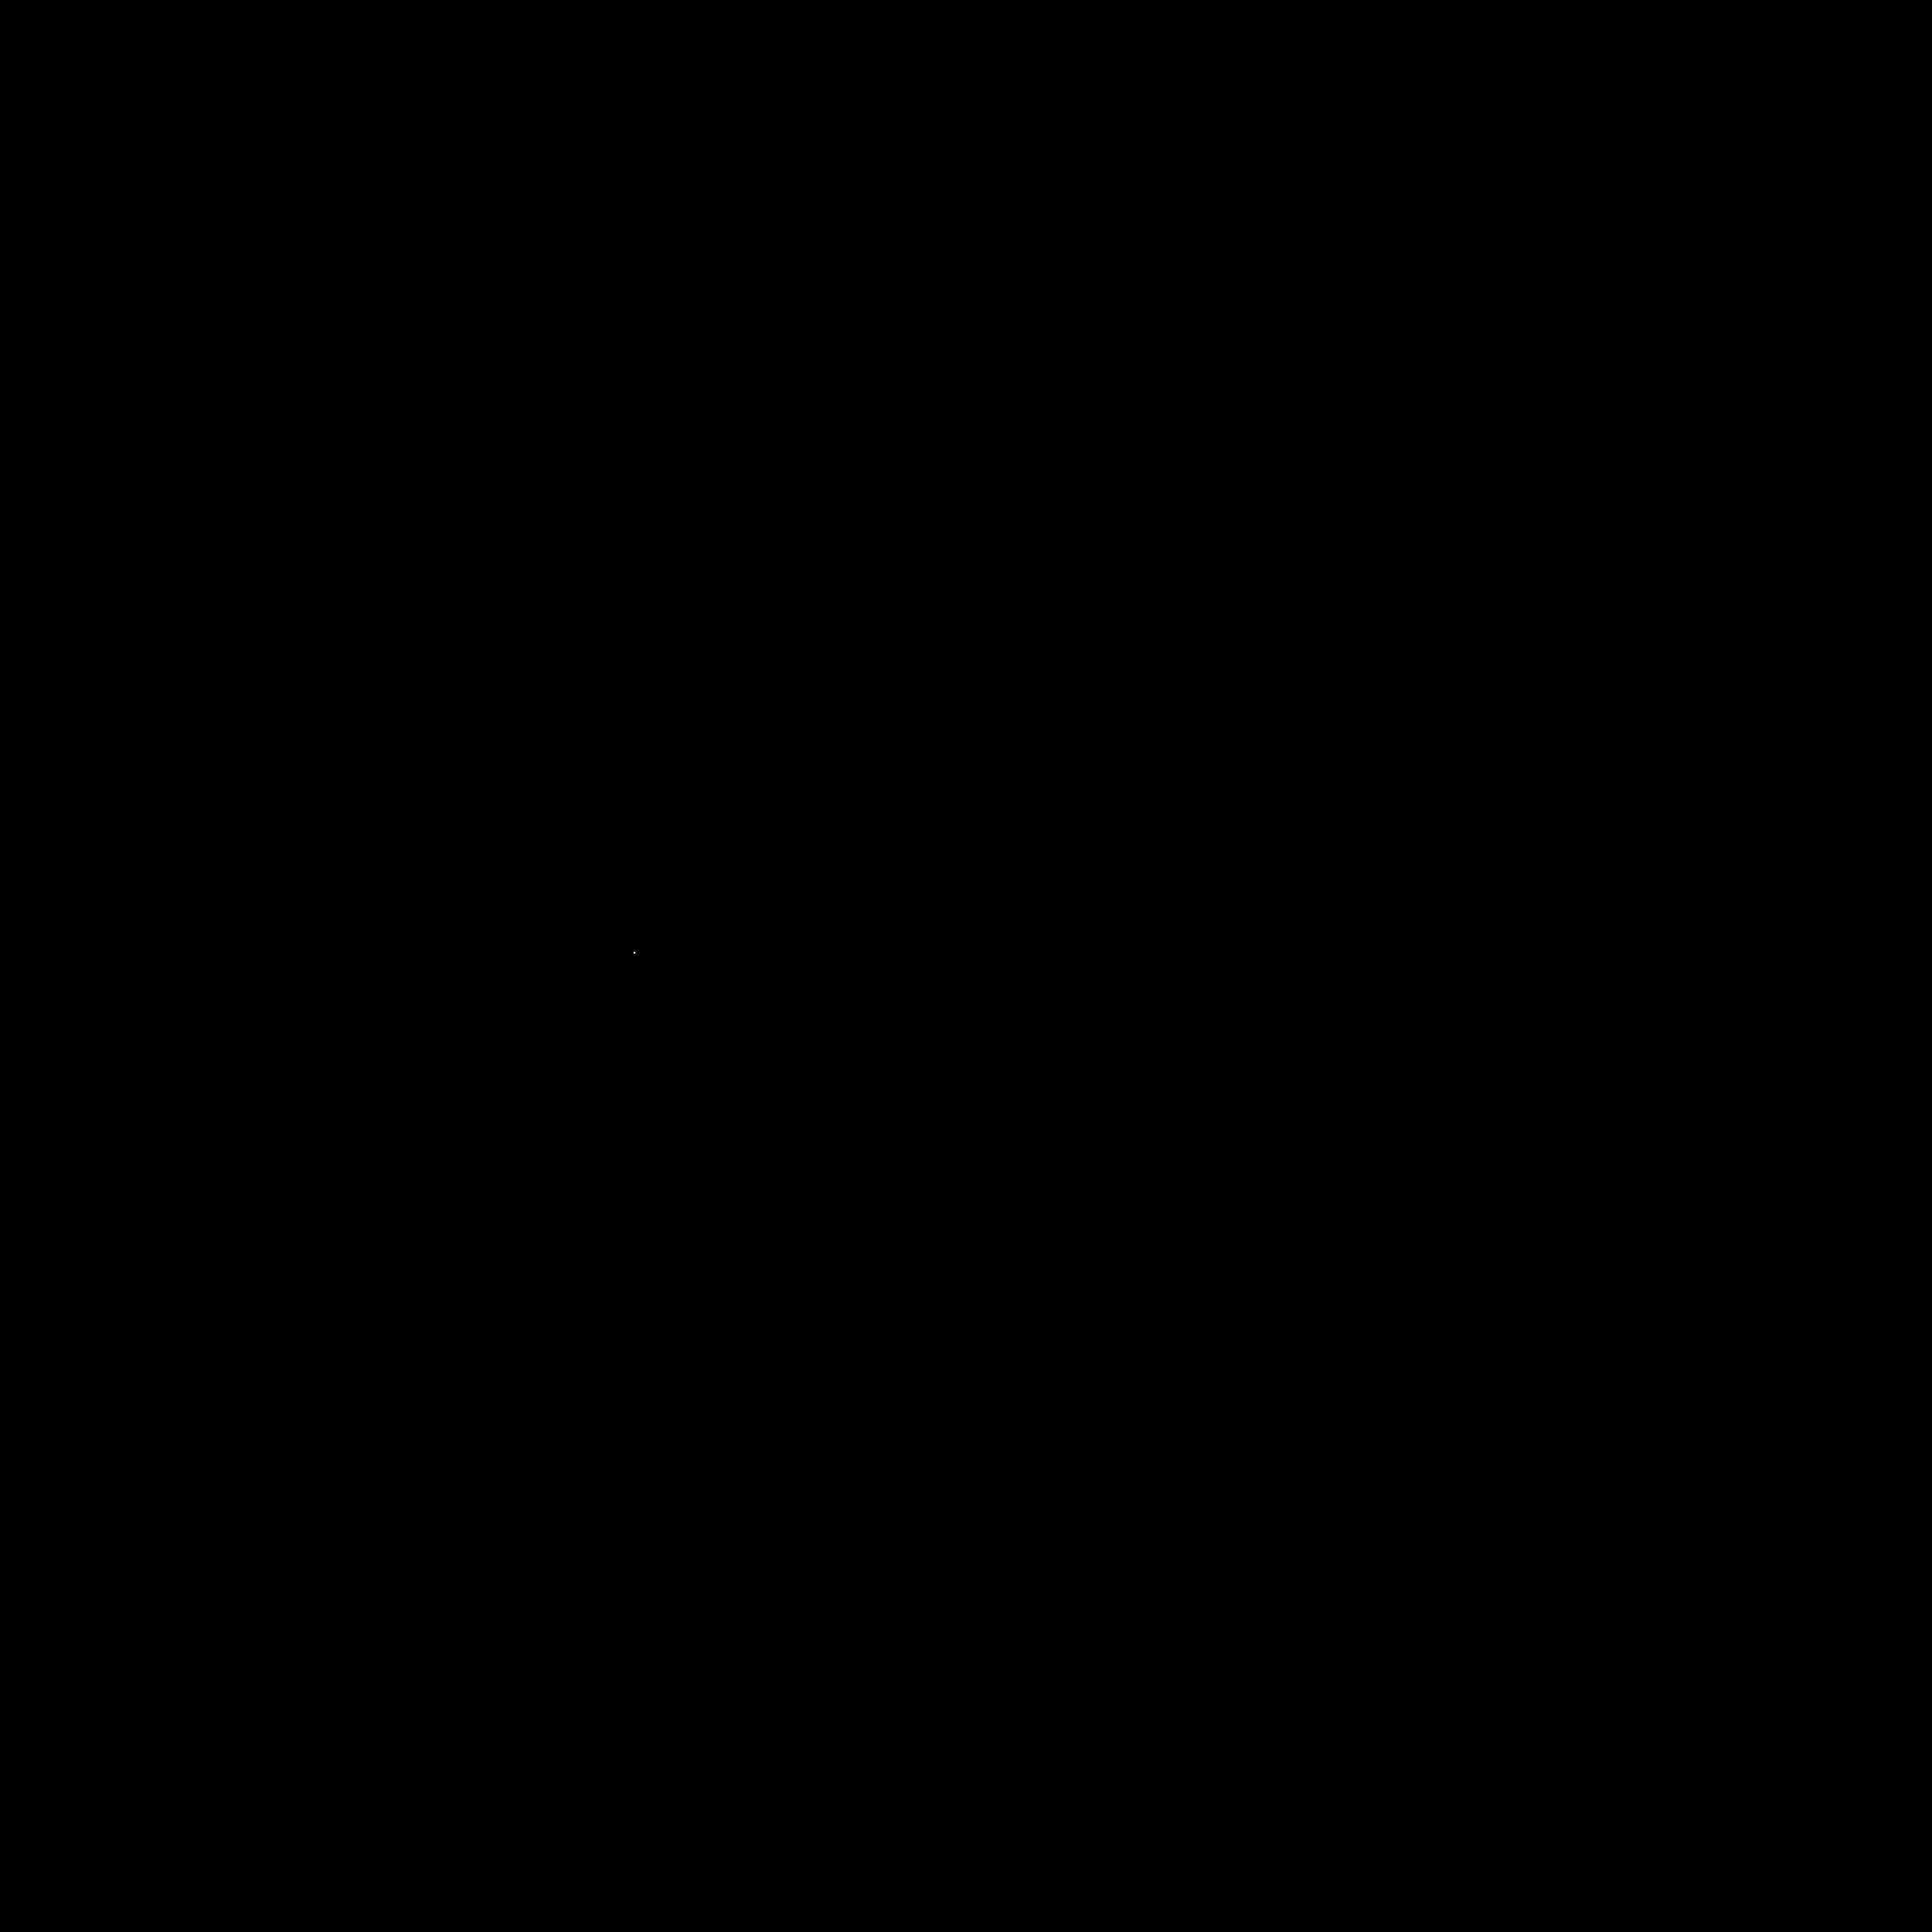 Furniture-(fill)-Web.png